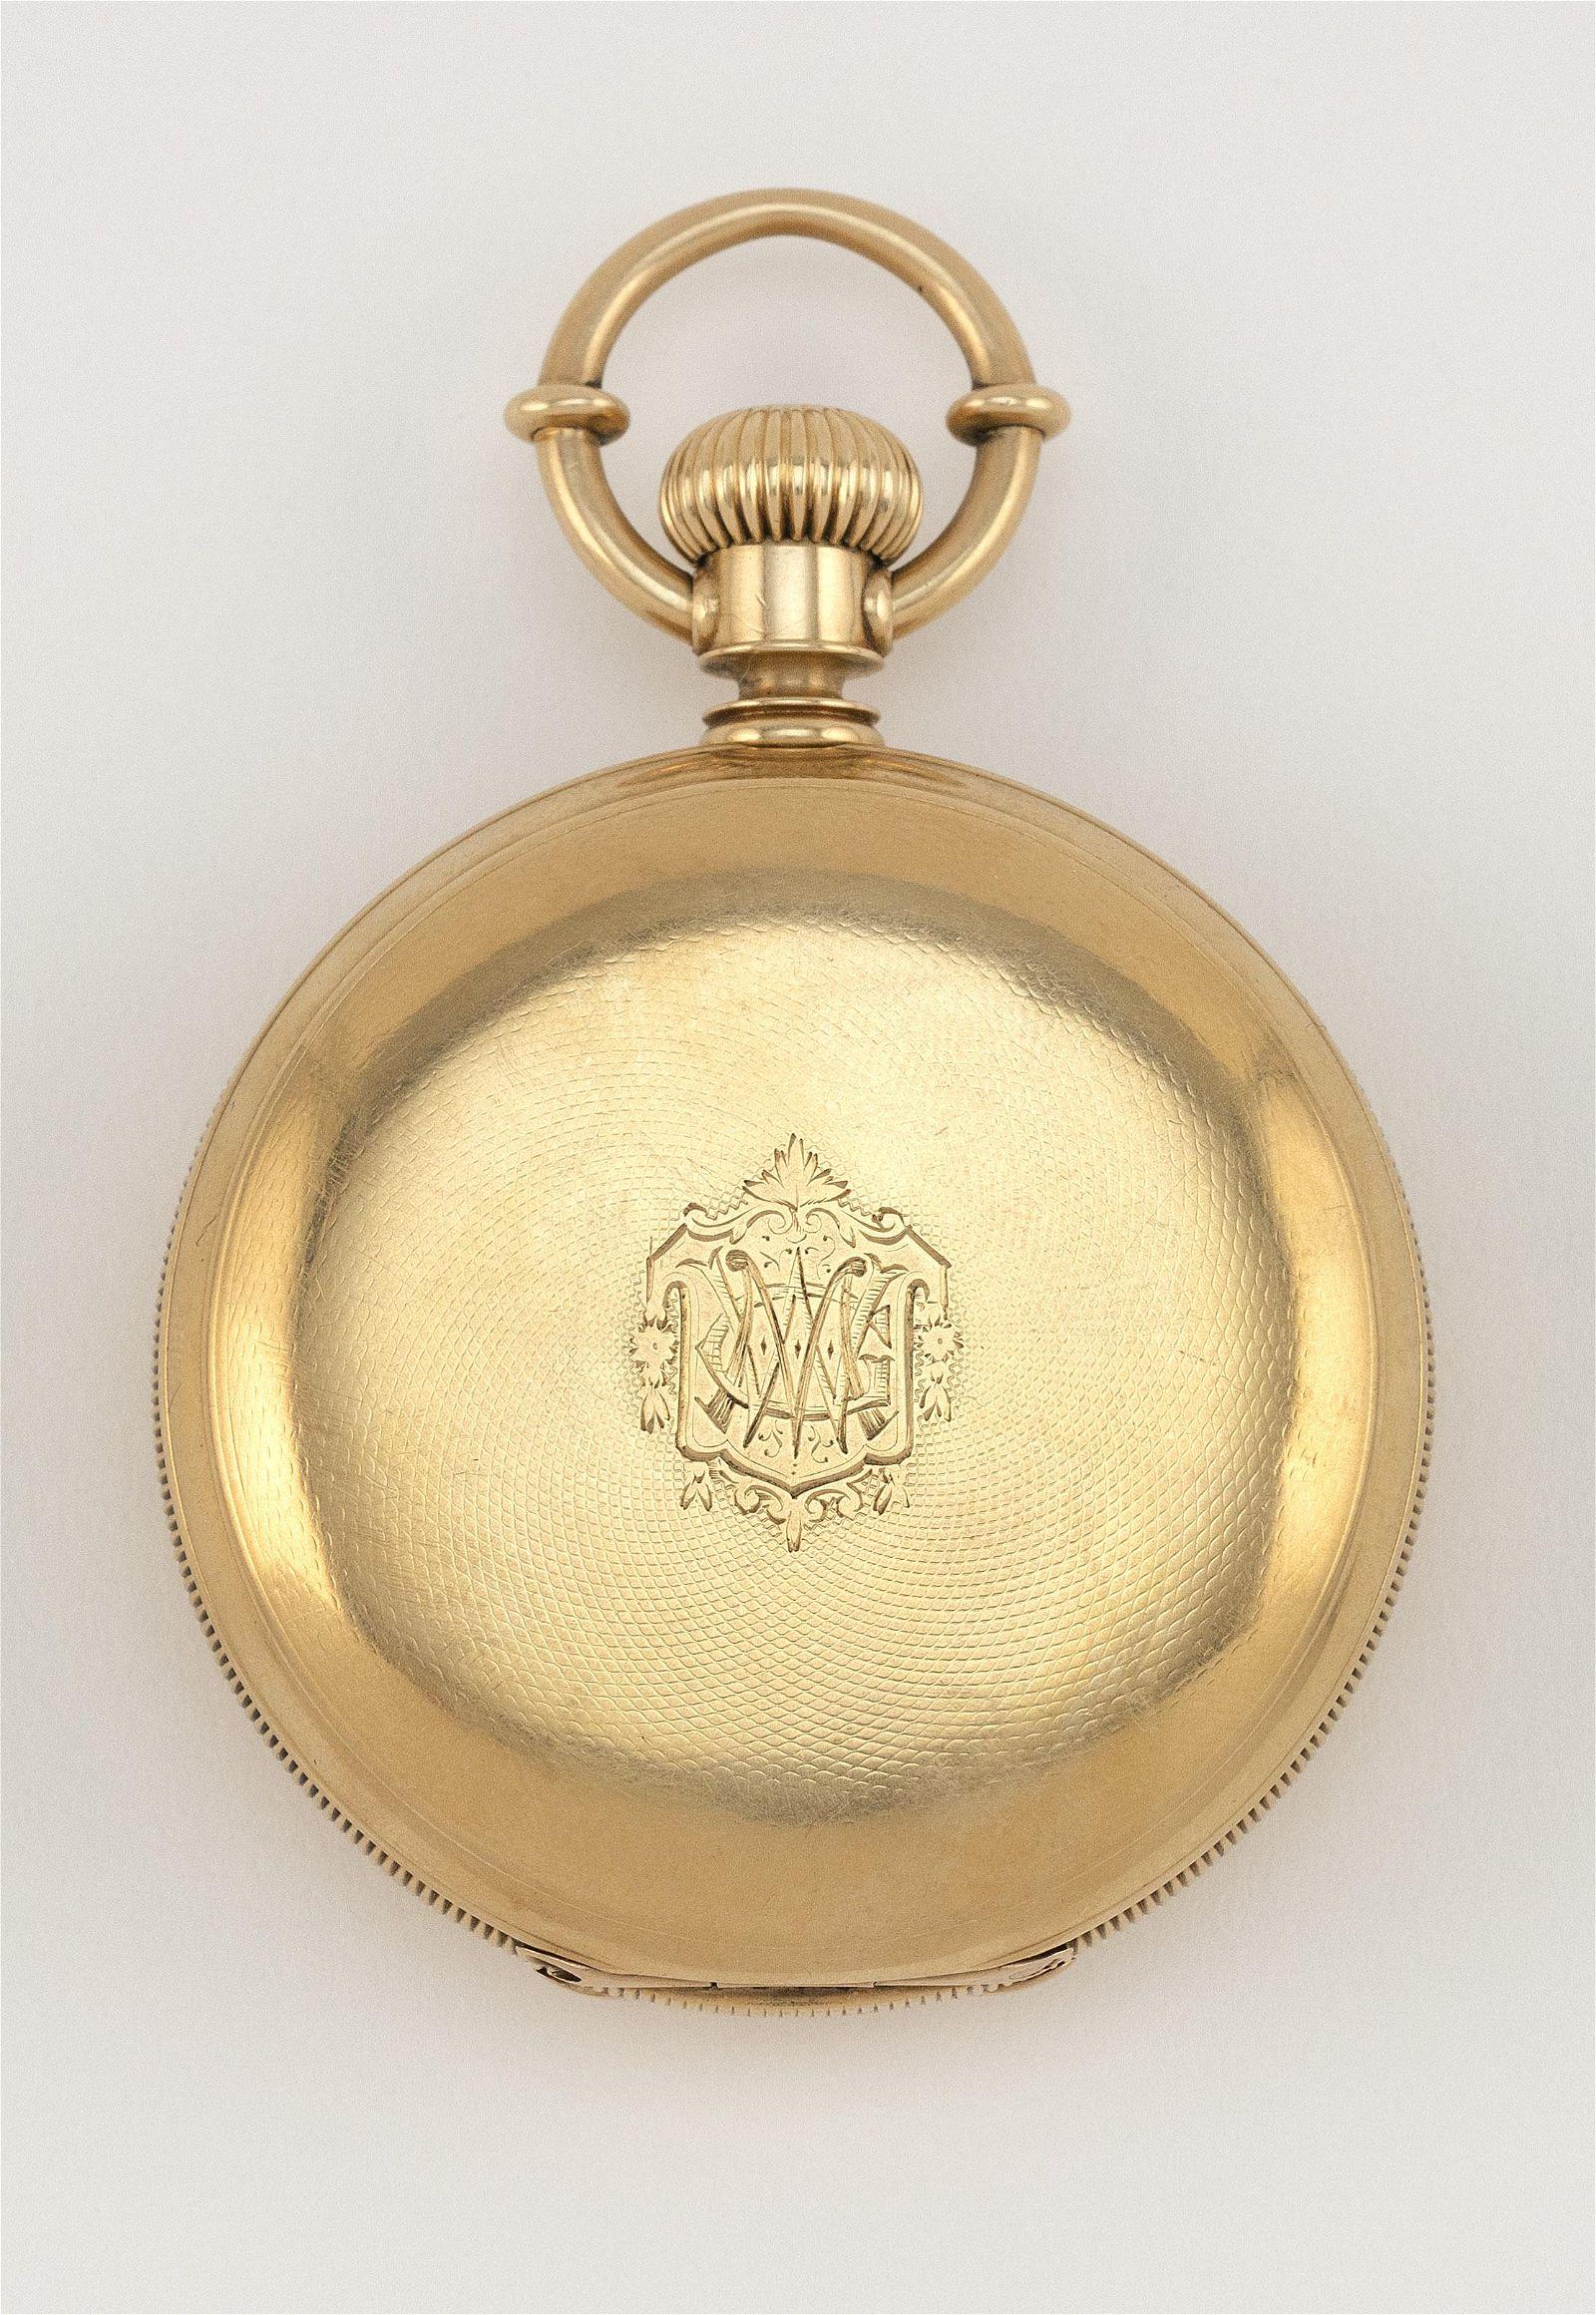 AMERICAN WATCH CO. 18KT GOLD CASED POCKET WATCH 1876